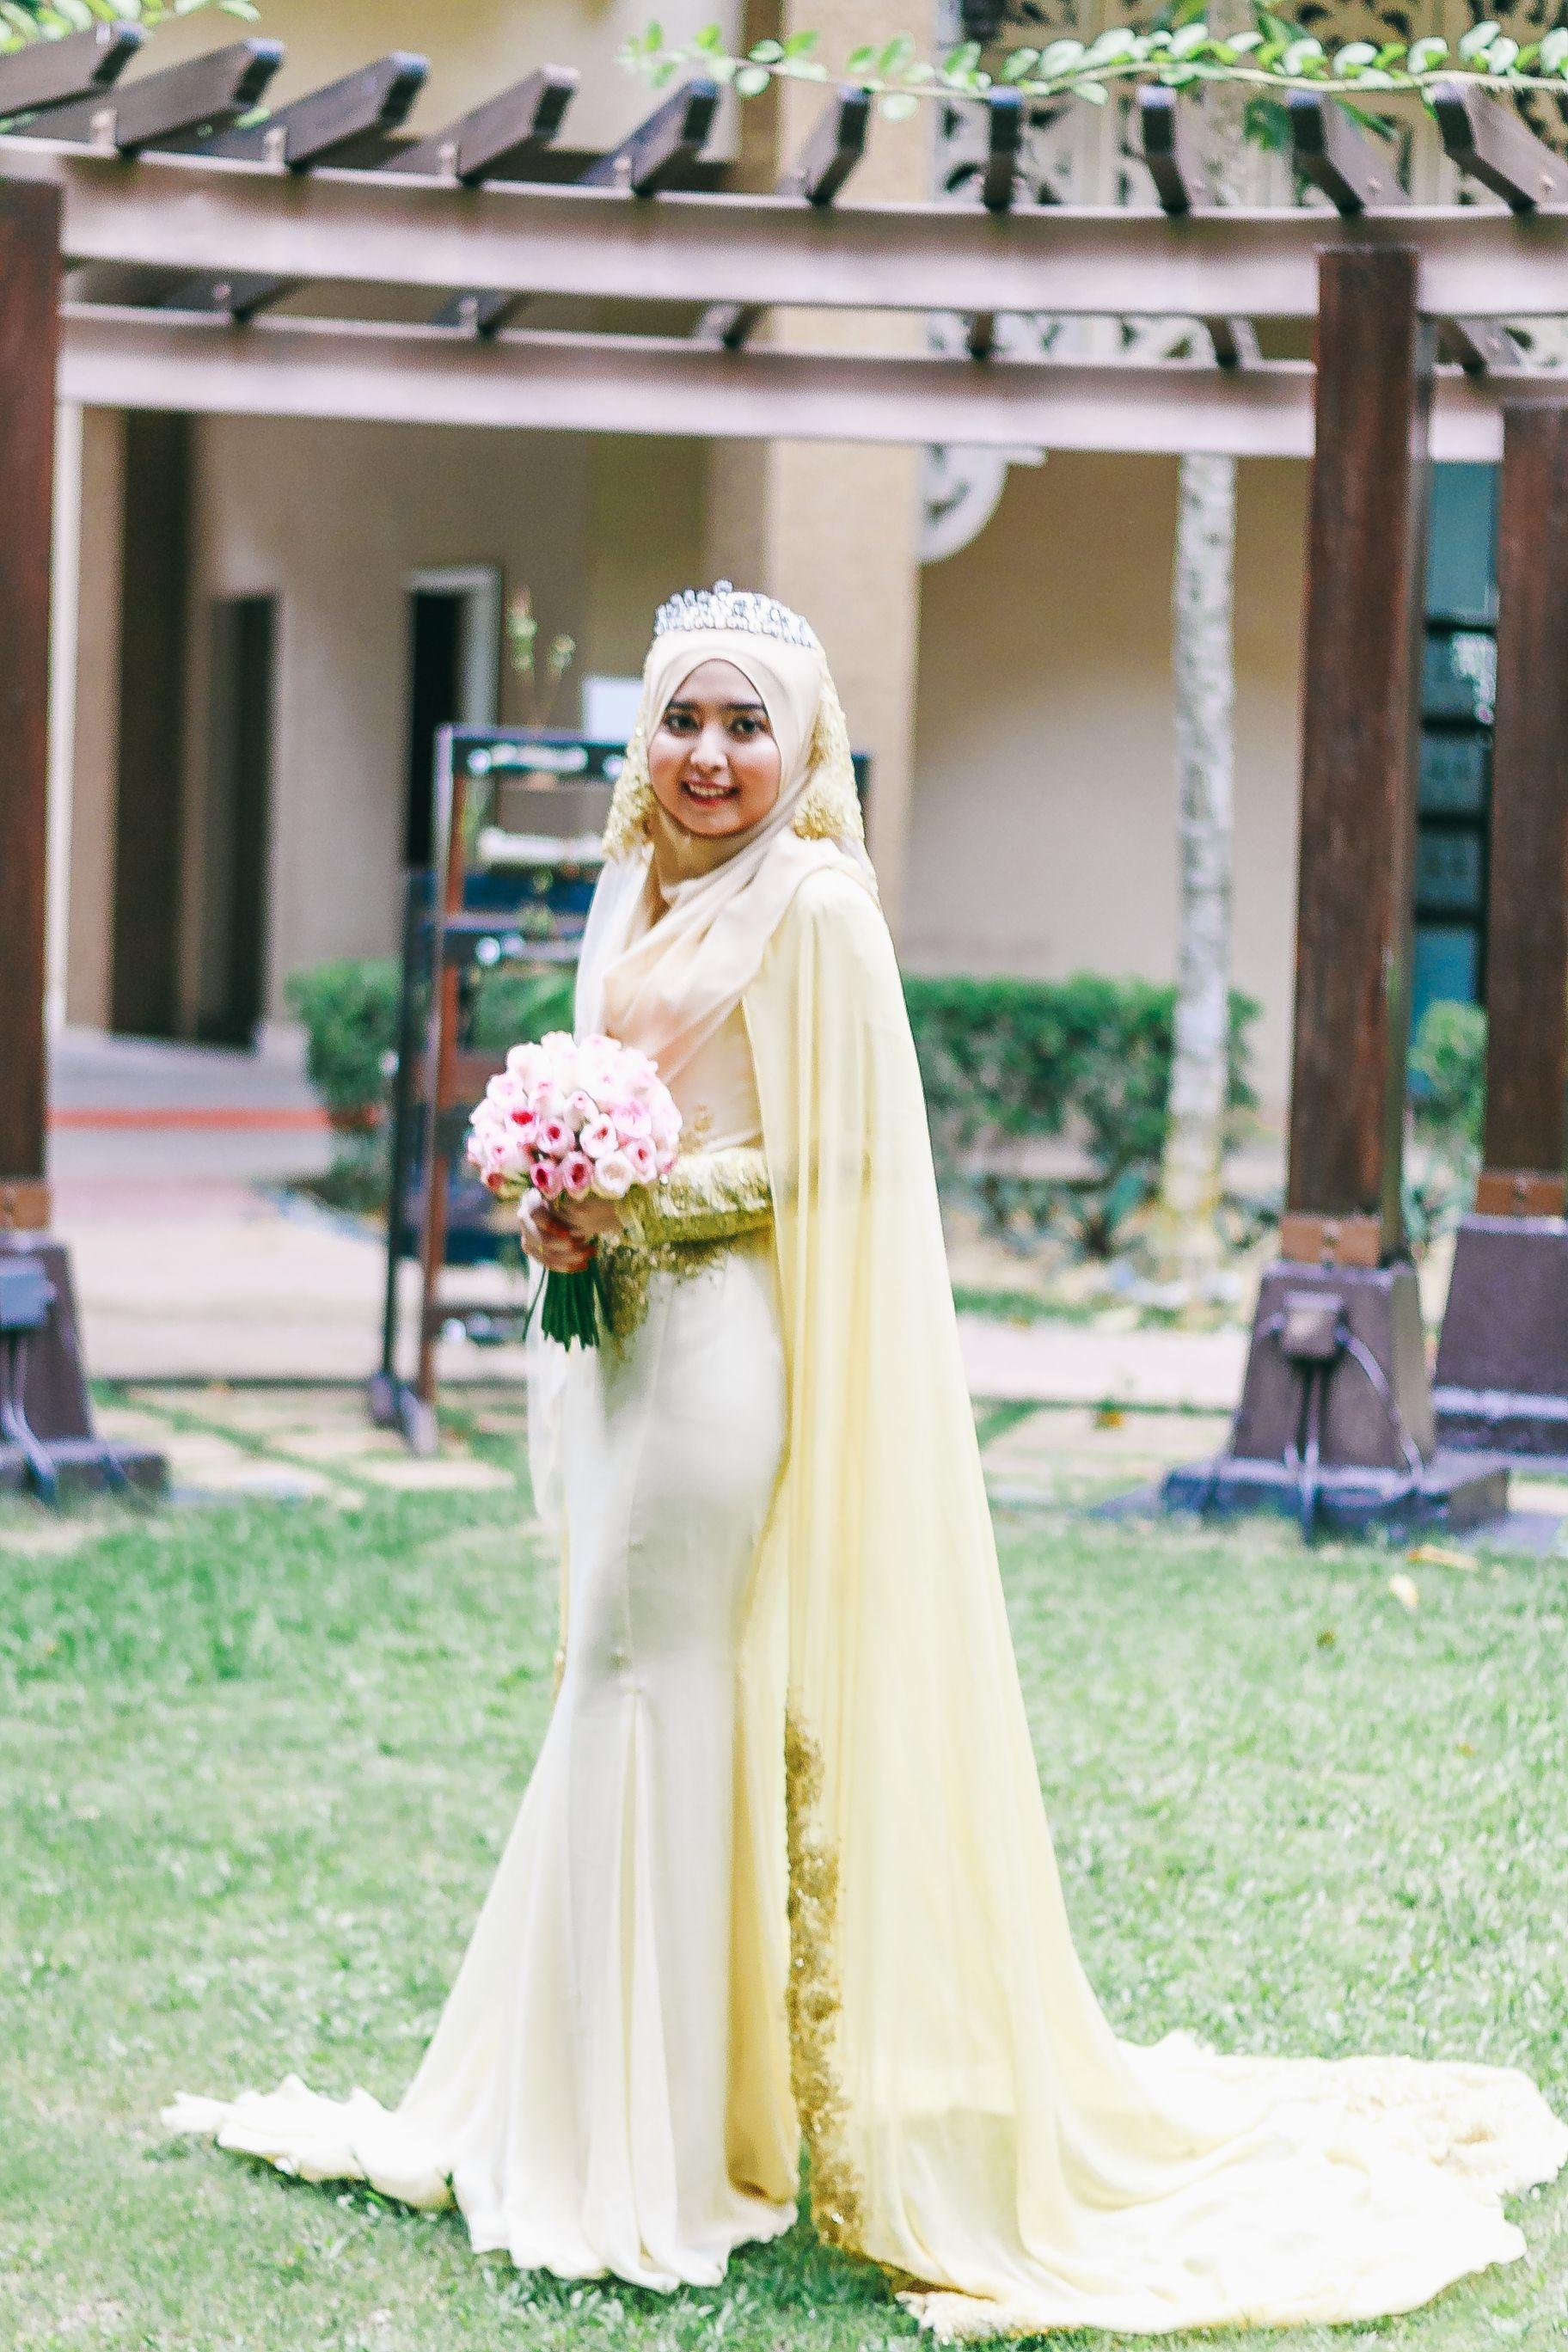 Emma Wedding   Wedding Dress & Attire in Kuala Lumpur   Bridestory.com